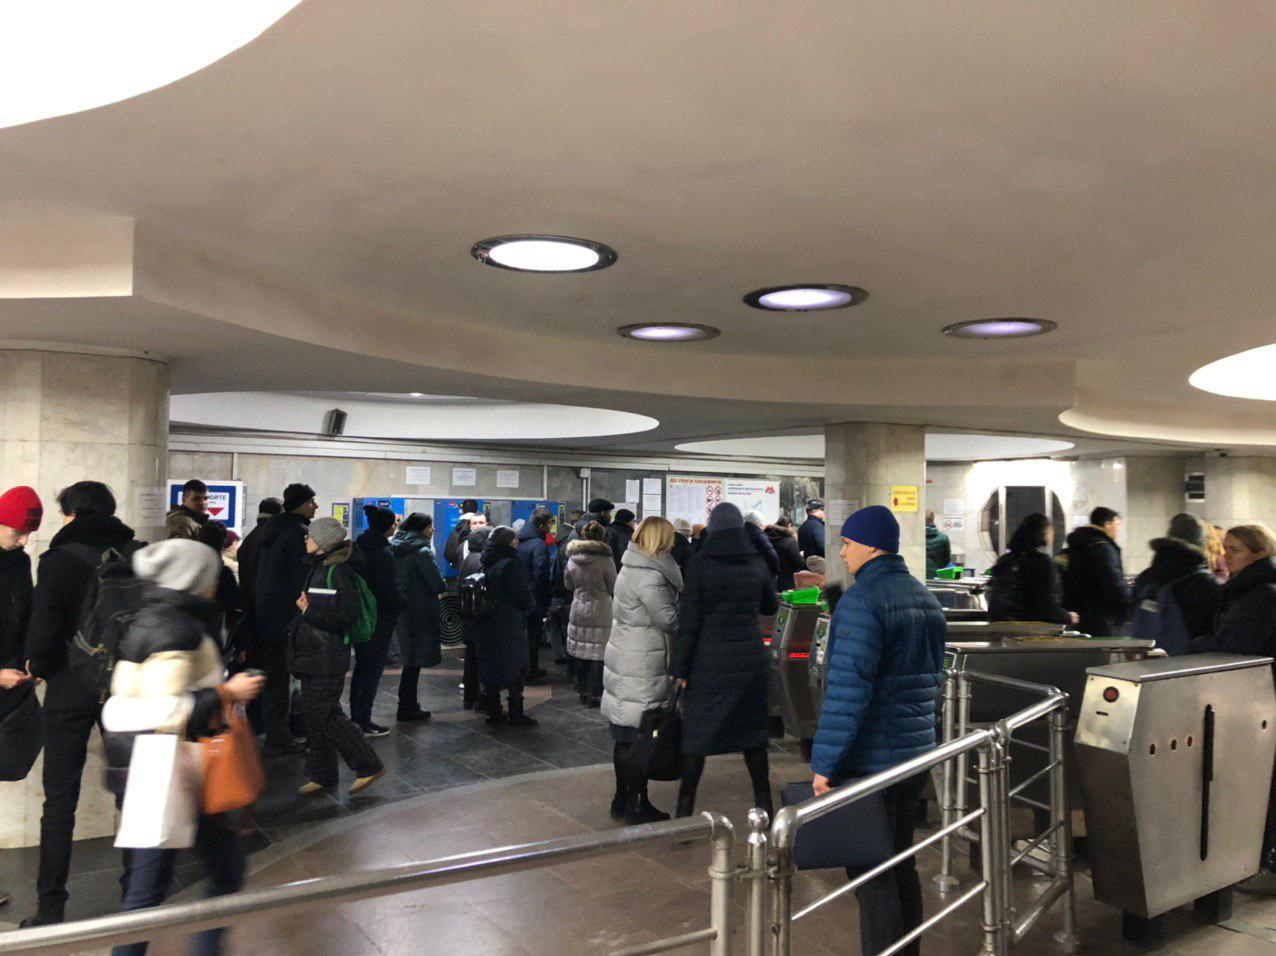 В метро Университет произошло столпотворение (фото)